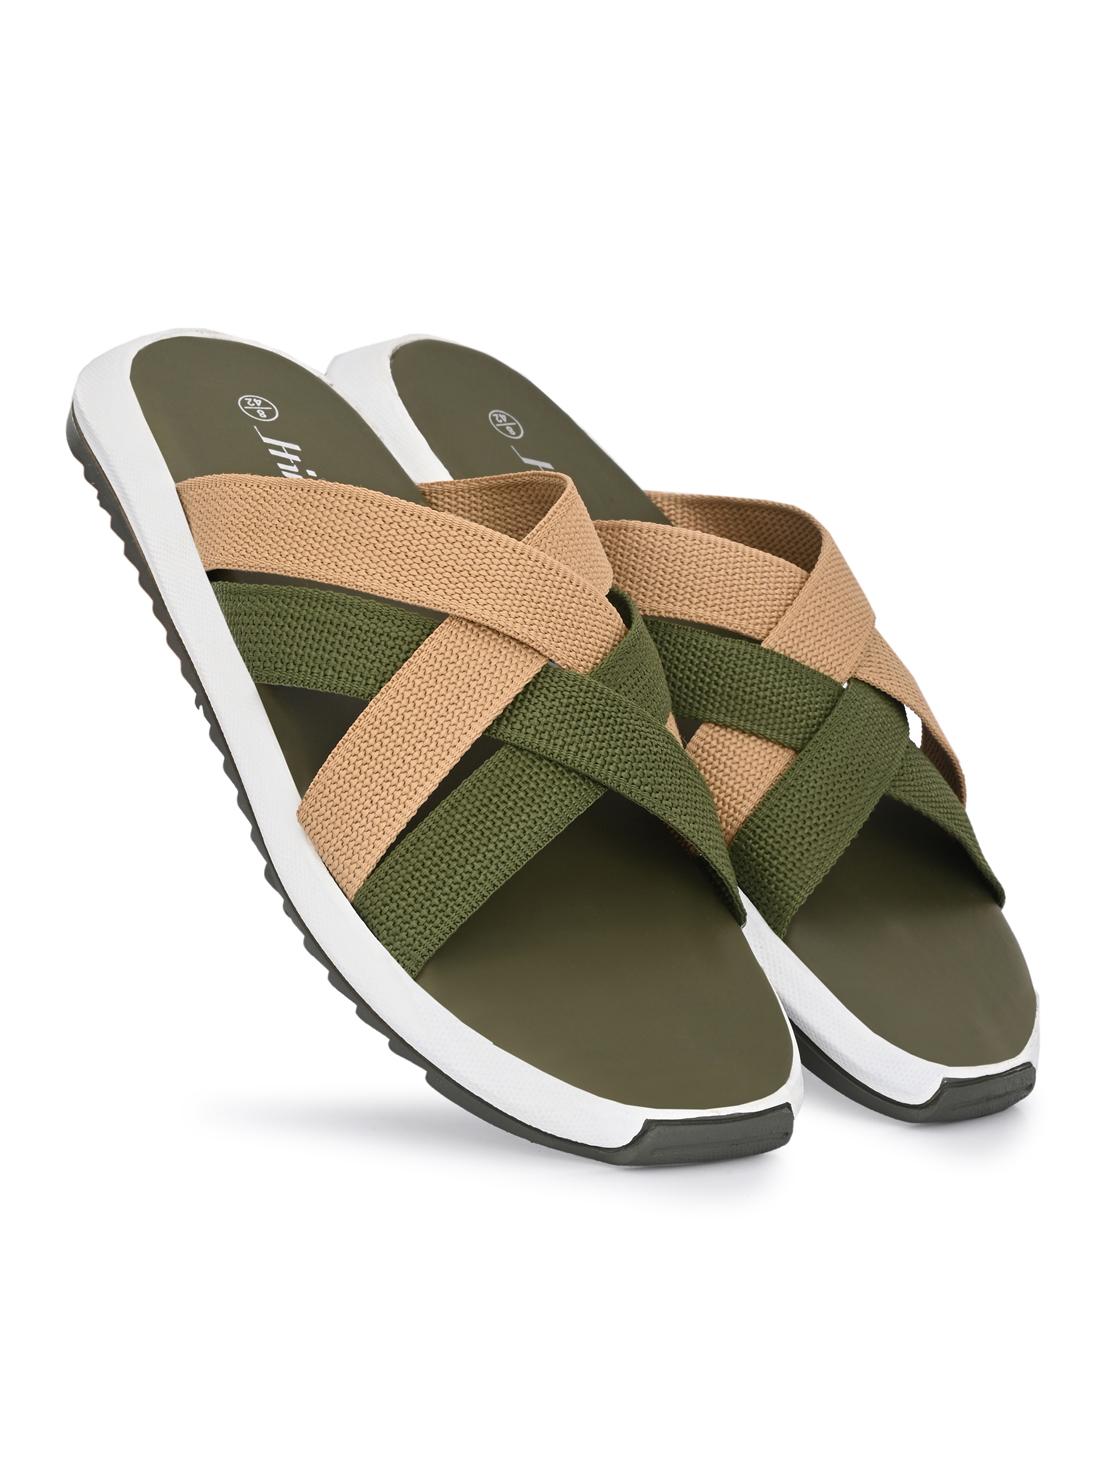 Hirolas | Hirolas® Men's Olive Strappy Flip-Flop Slider Slippers (UK6/EU40)